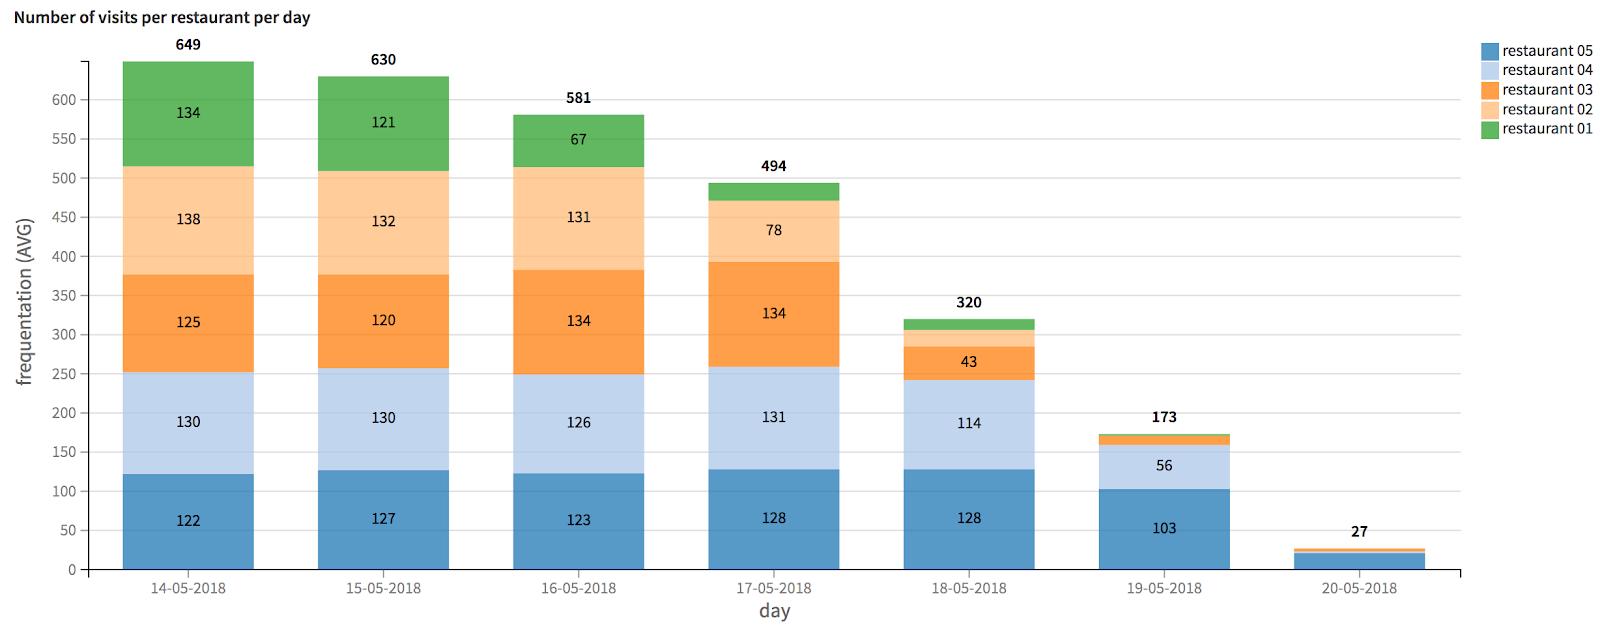 stacked bar chart restaurant attendance per day